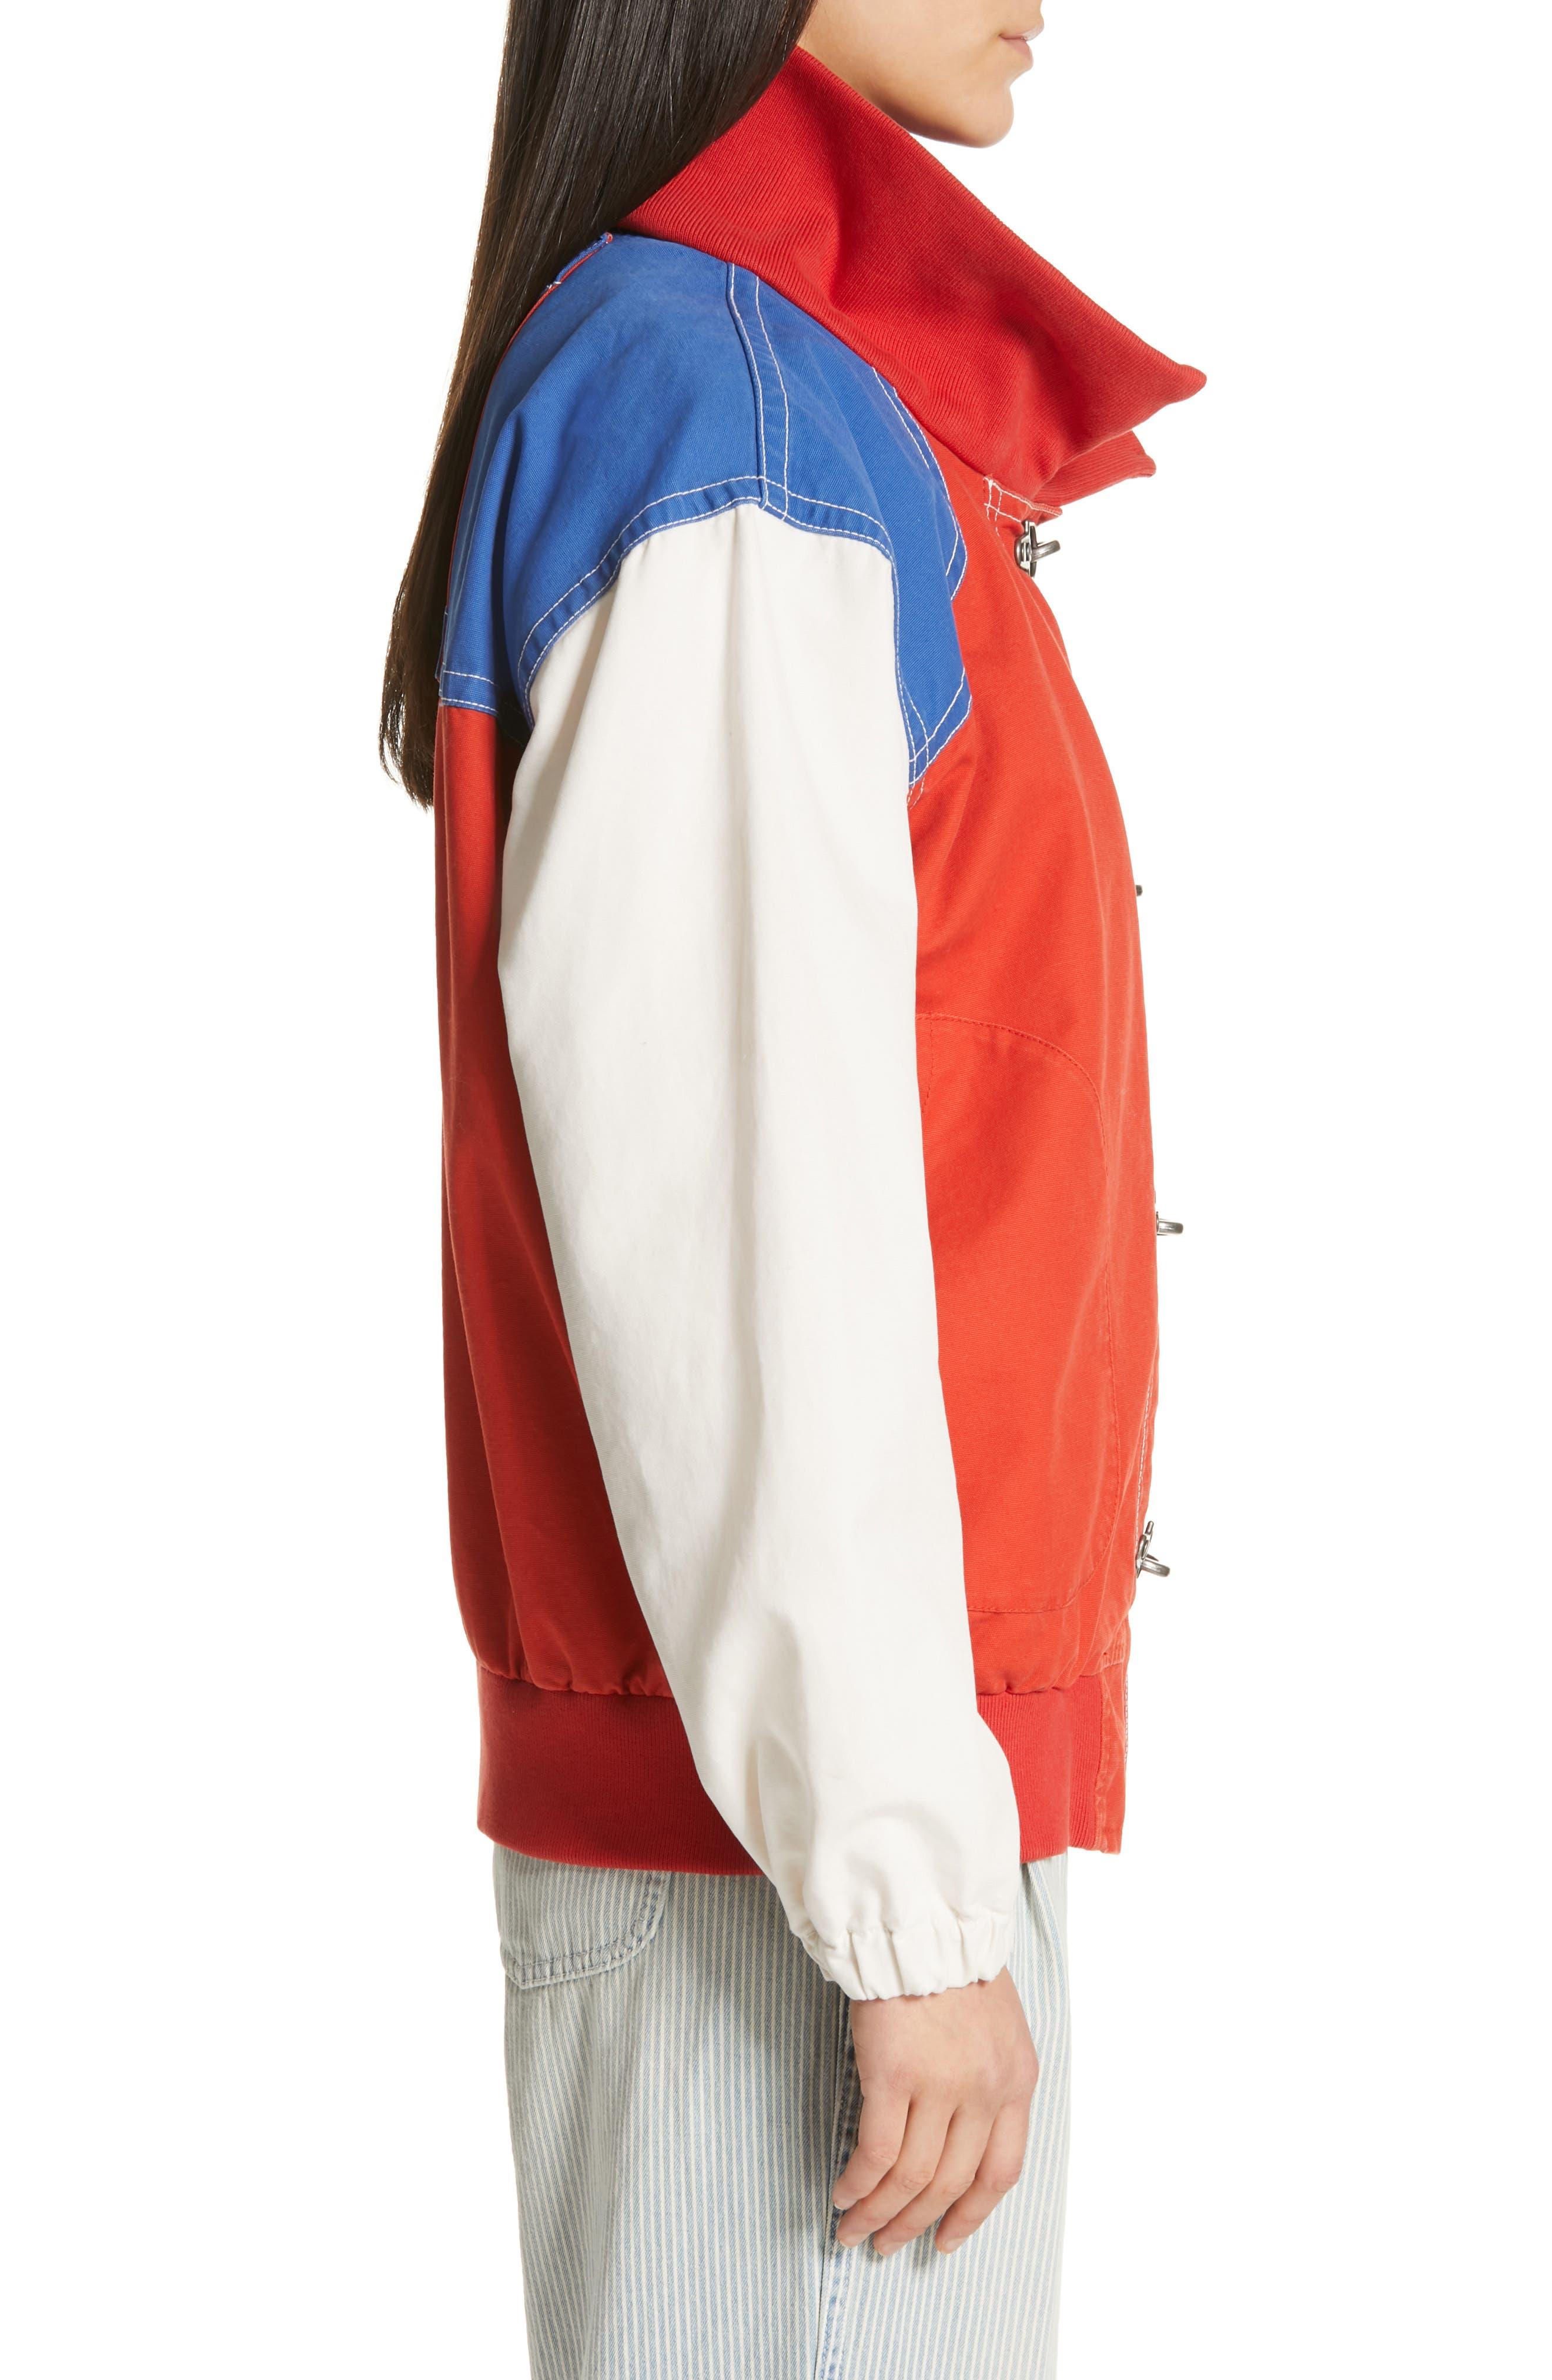 POLO RALPH LAUREN, Colorblock Utility Jacket, Alternate thumbnail 4, color, ORANGE/CREAM/ SAPPHIRE